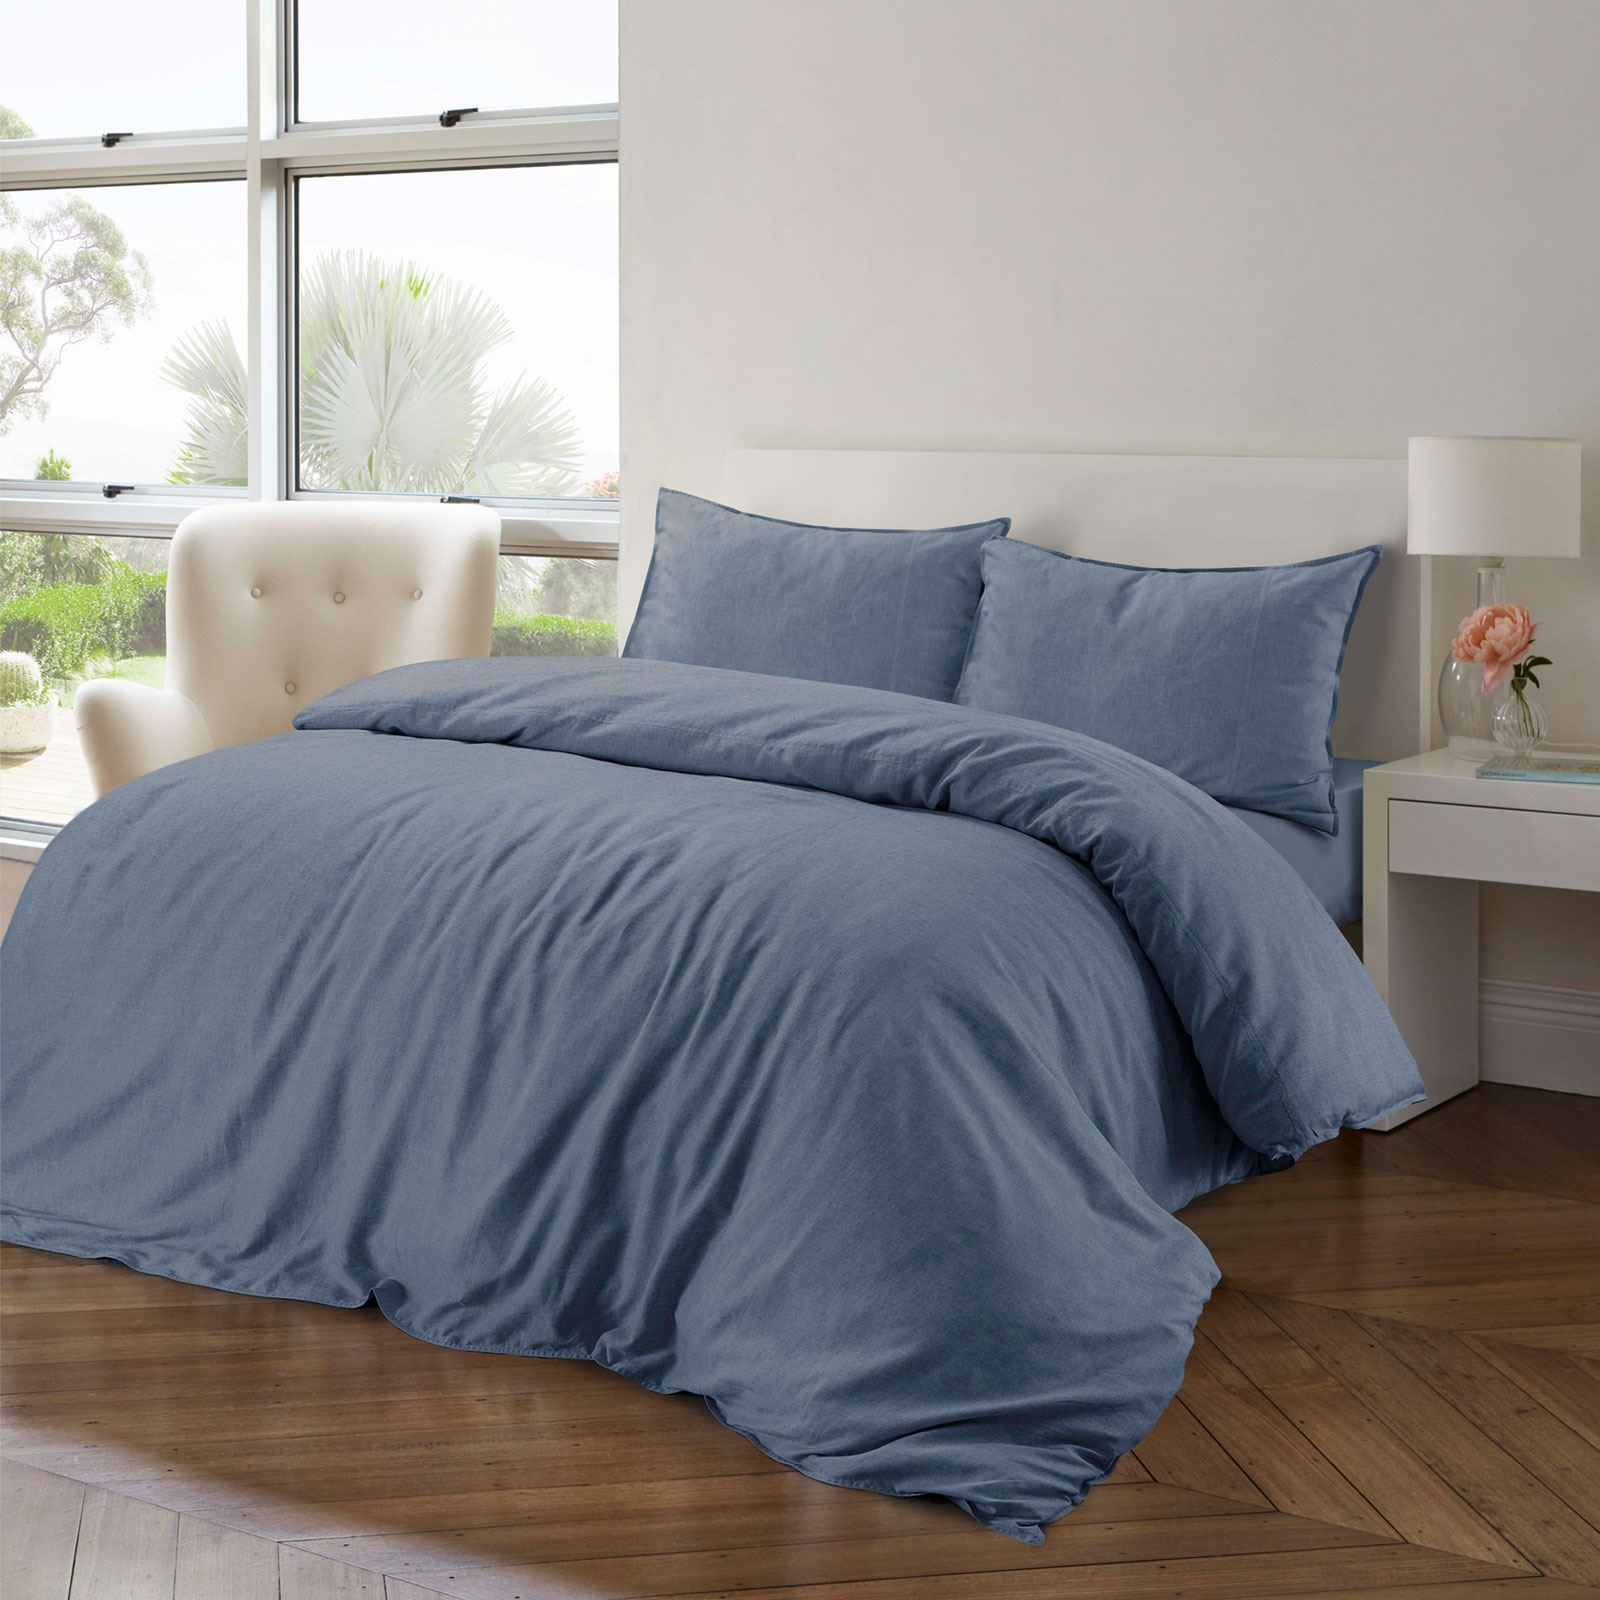 100-Cotton-Linen-Pure-Natural-Duvet-Cover-Bedding-Set-Double-King-Single thumbnail 13